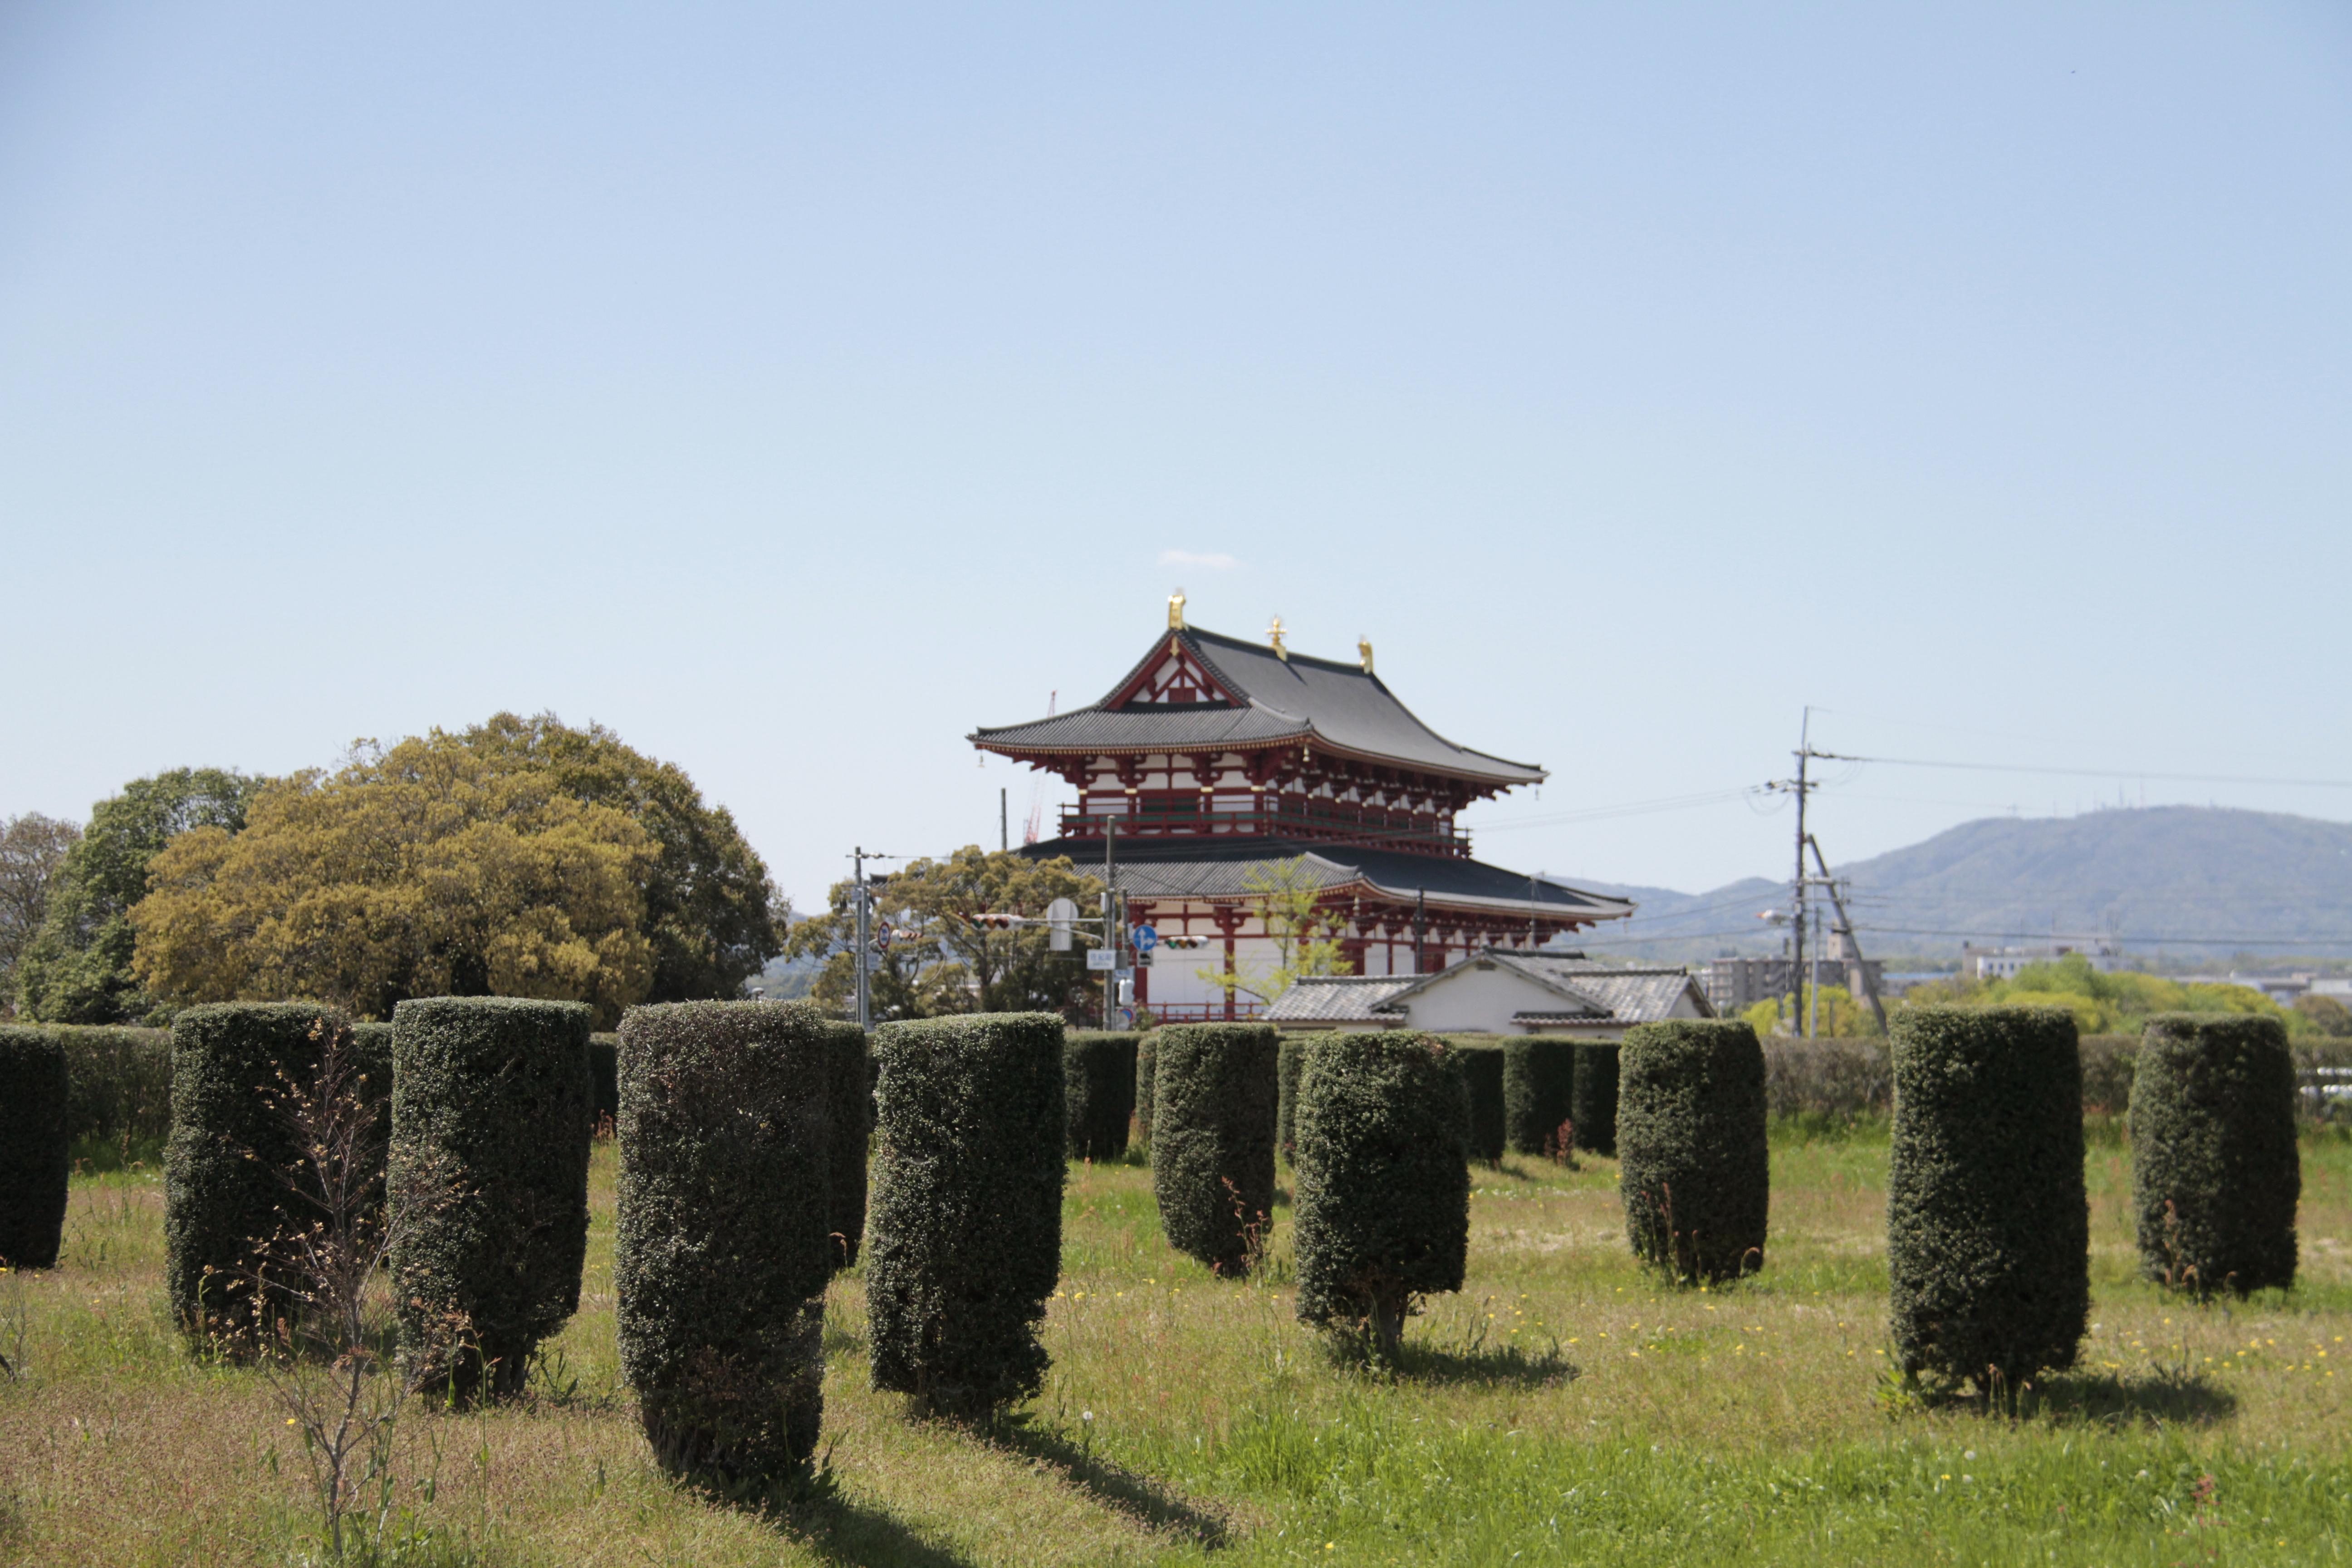 Japon avril 2017_0528 Nara palais Heijō